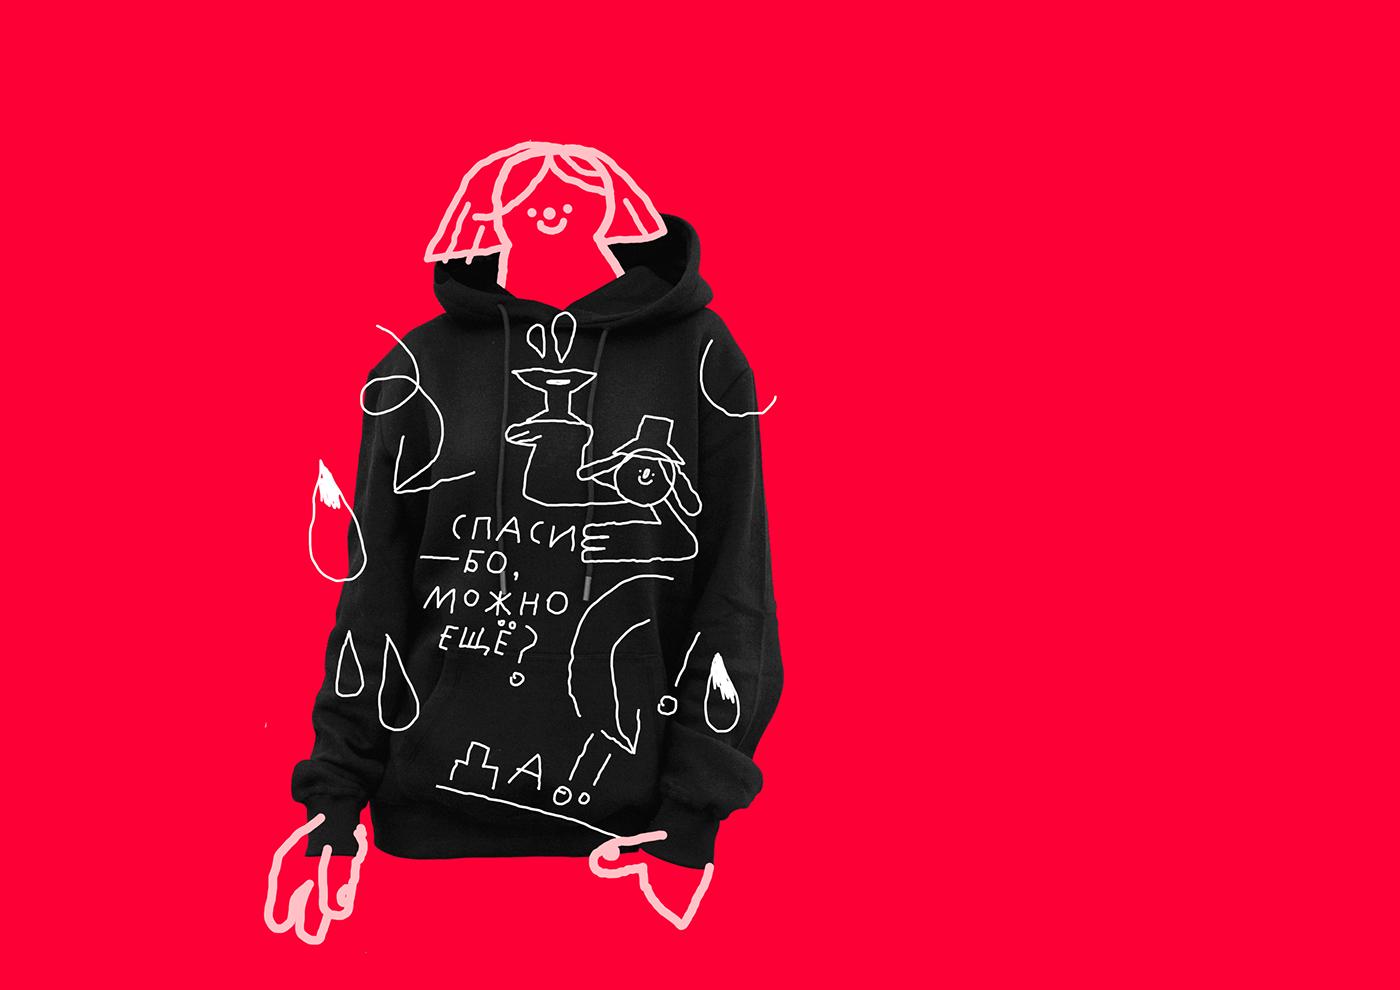 brand Clothing design Drawing  graphic design  hoodie design identity print textile design  vector